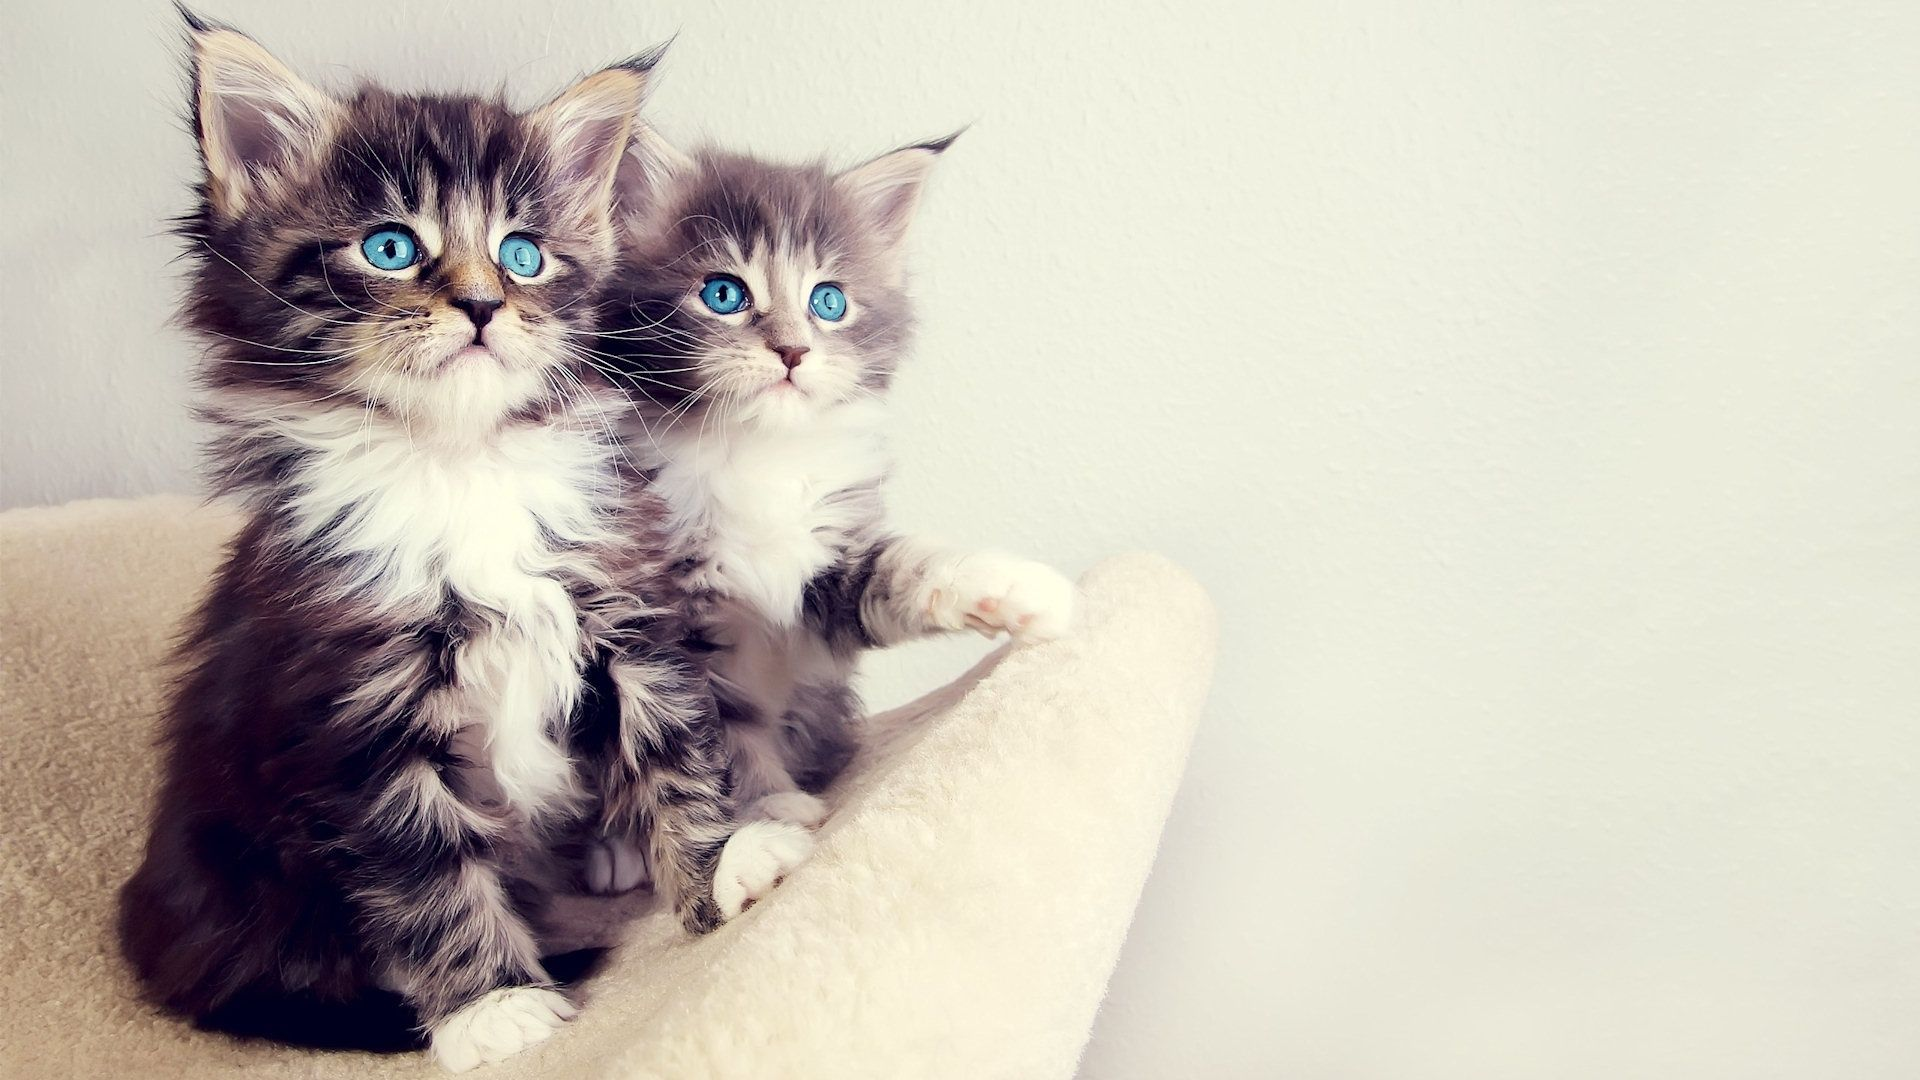 Kitten Wallpapers Background Free Download Kittens Cutest Baby